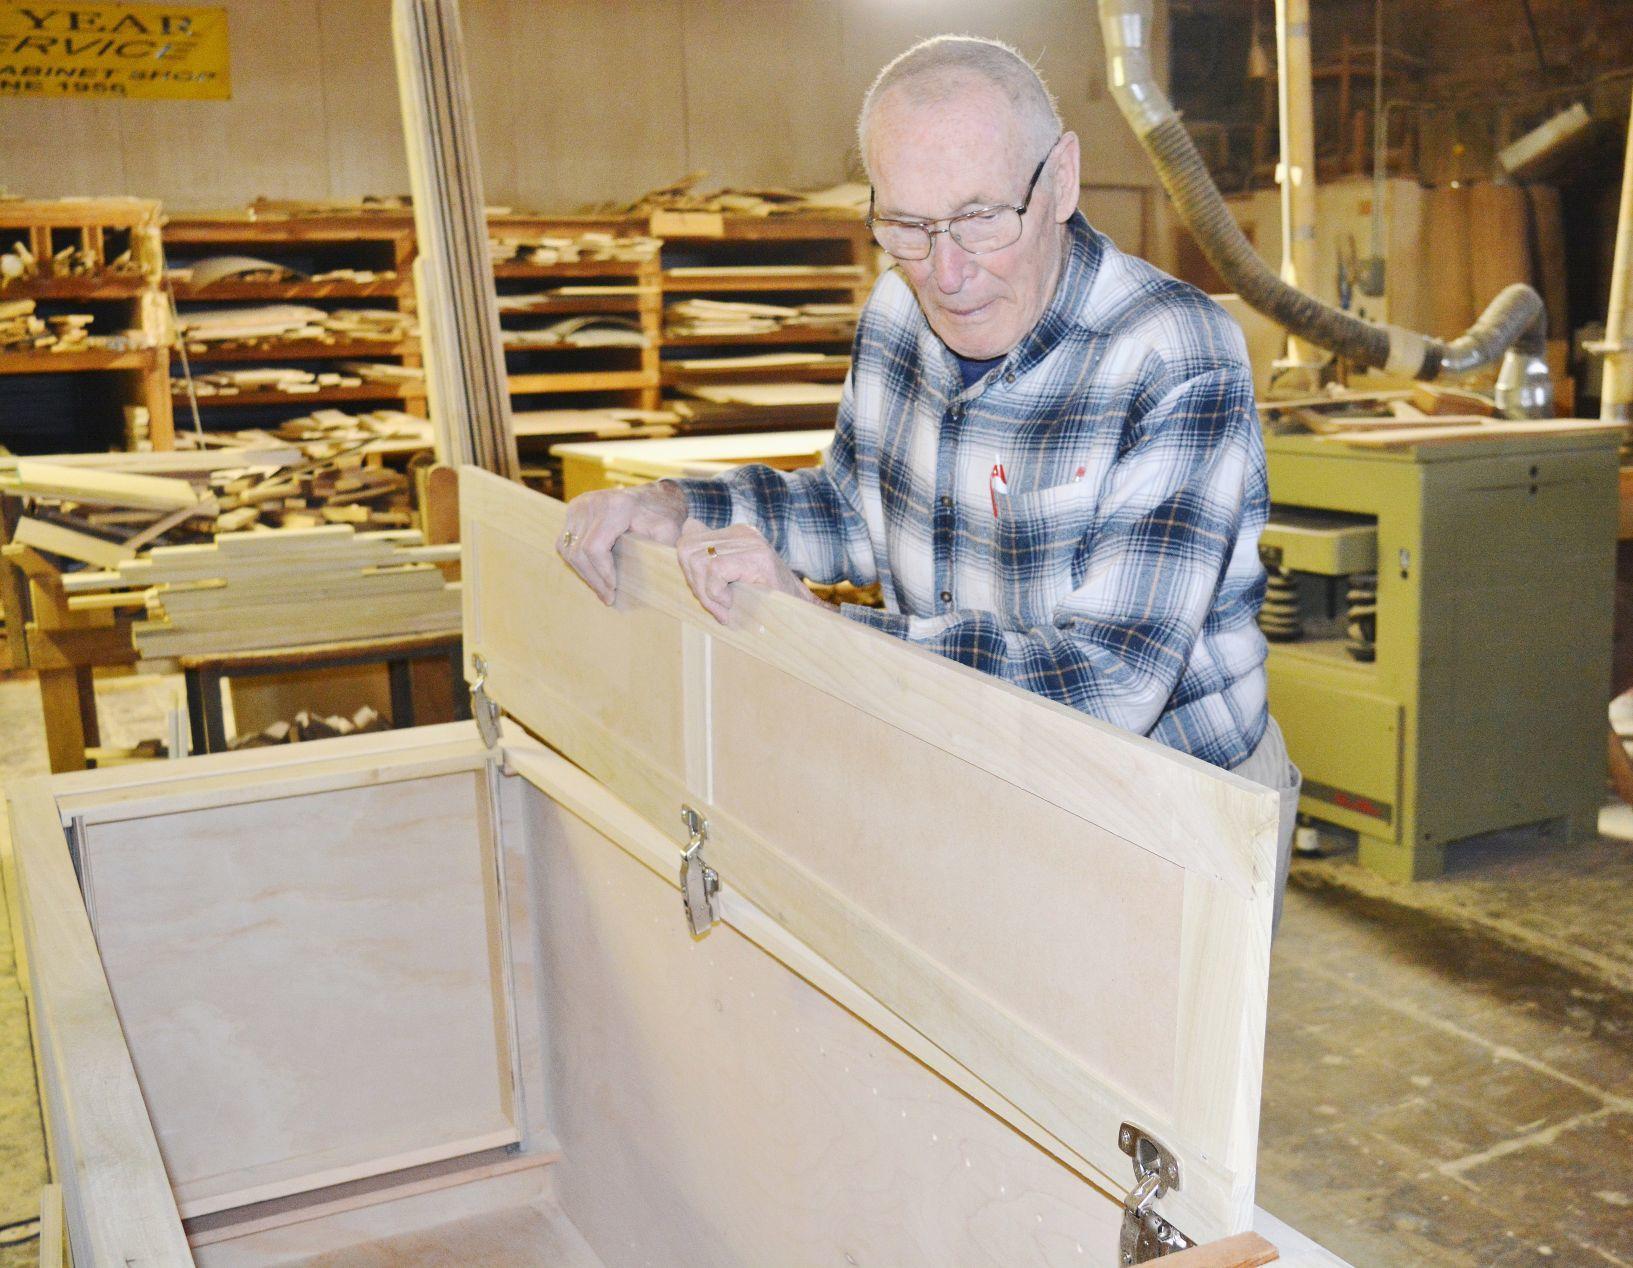 Chamber honors longevity of Hadlock Cabinet & Appliance